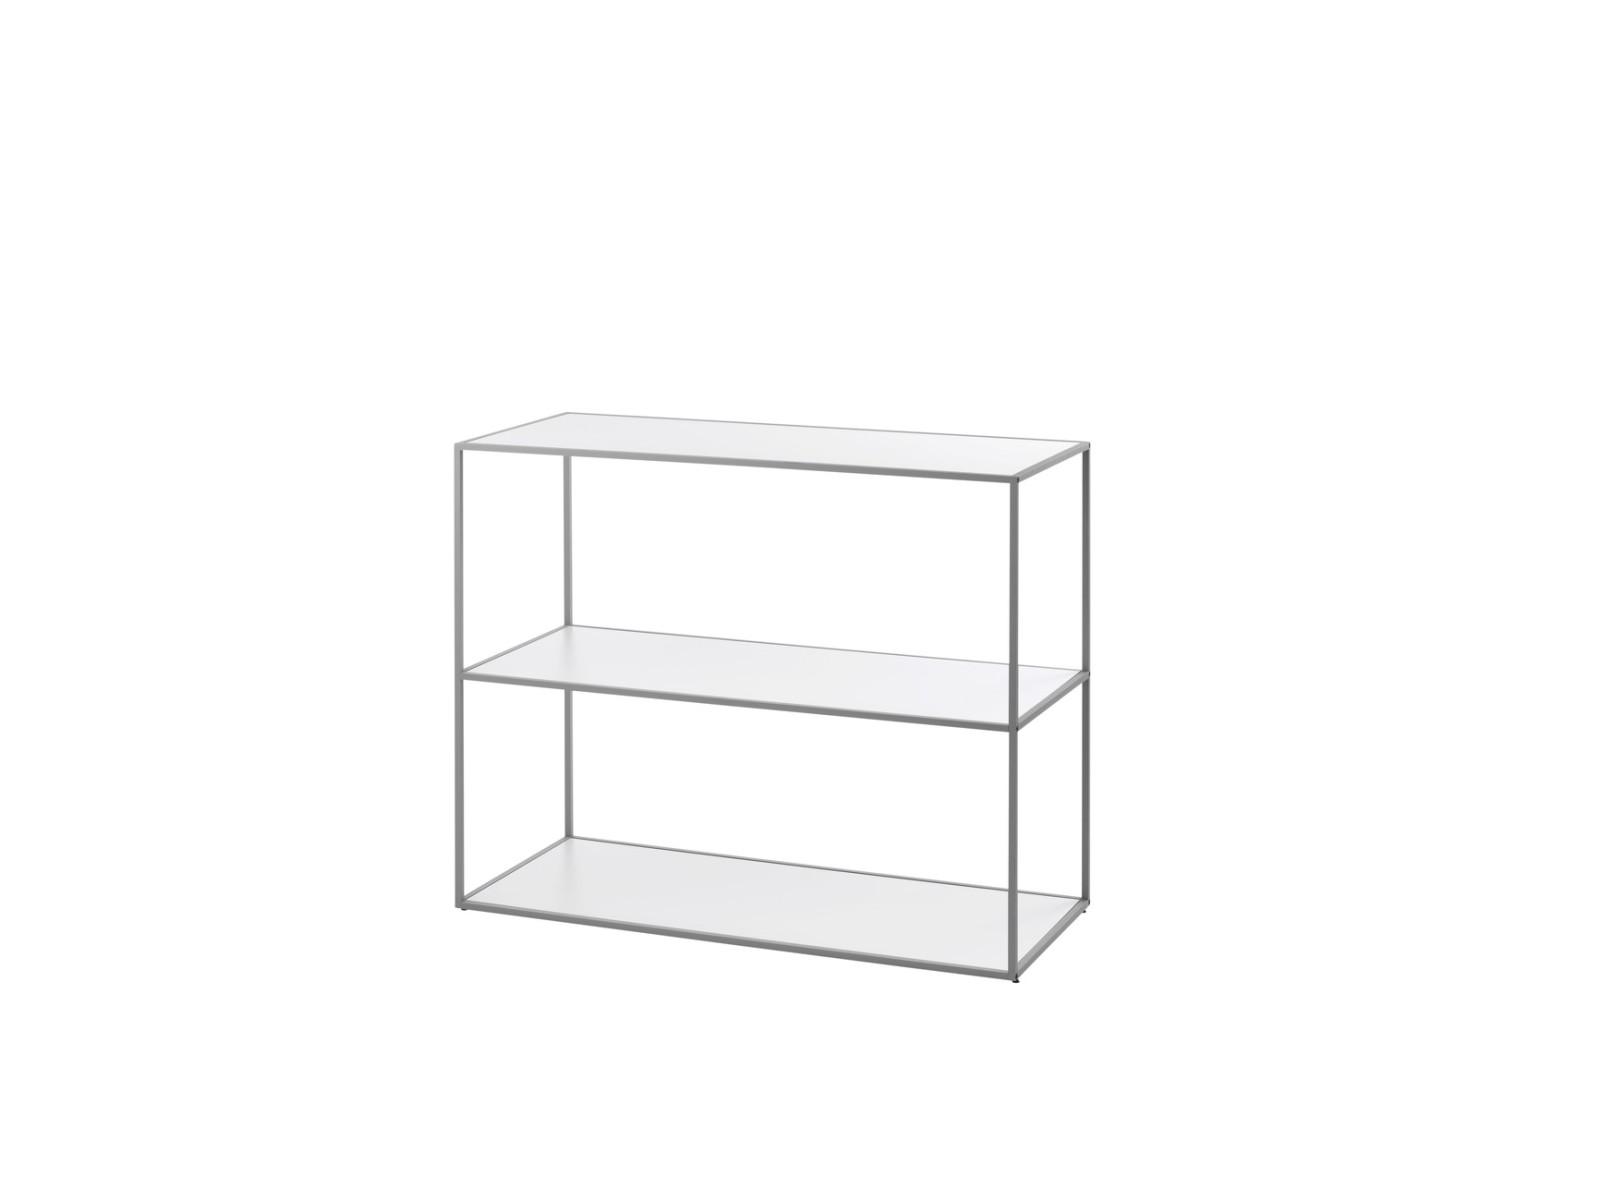 Twin Bookcase - 3 Shelves Grey